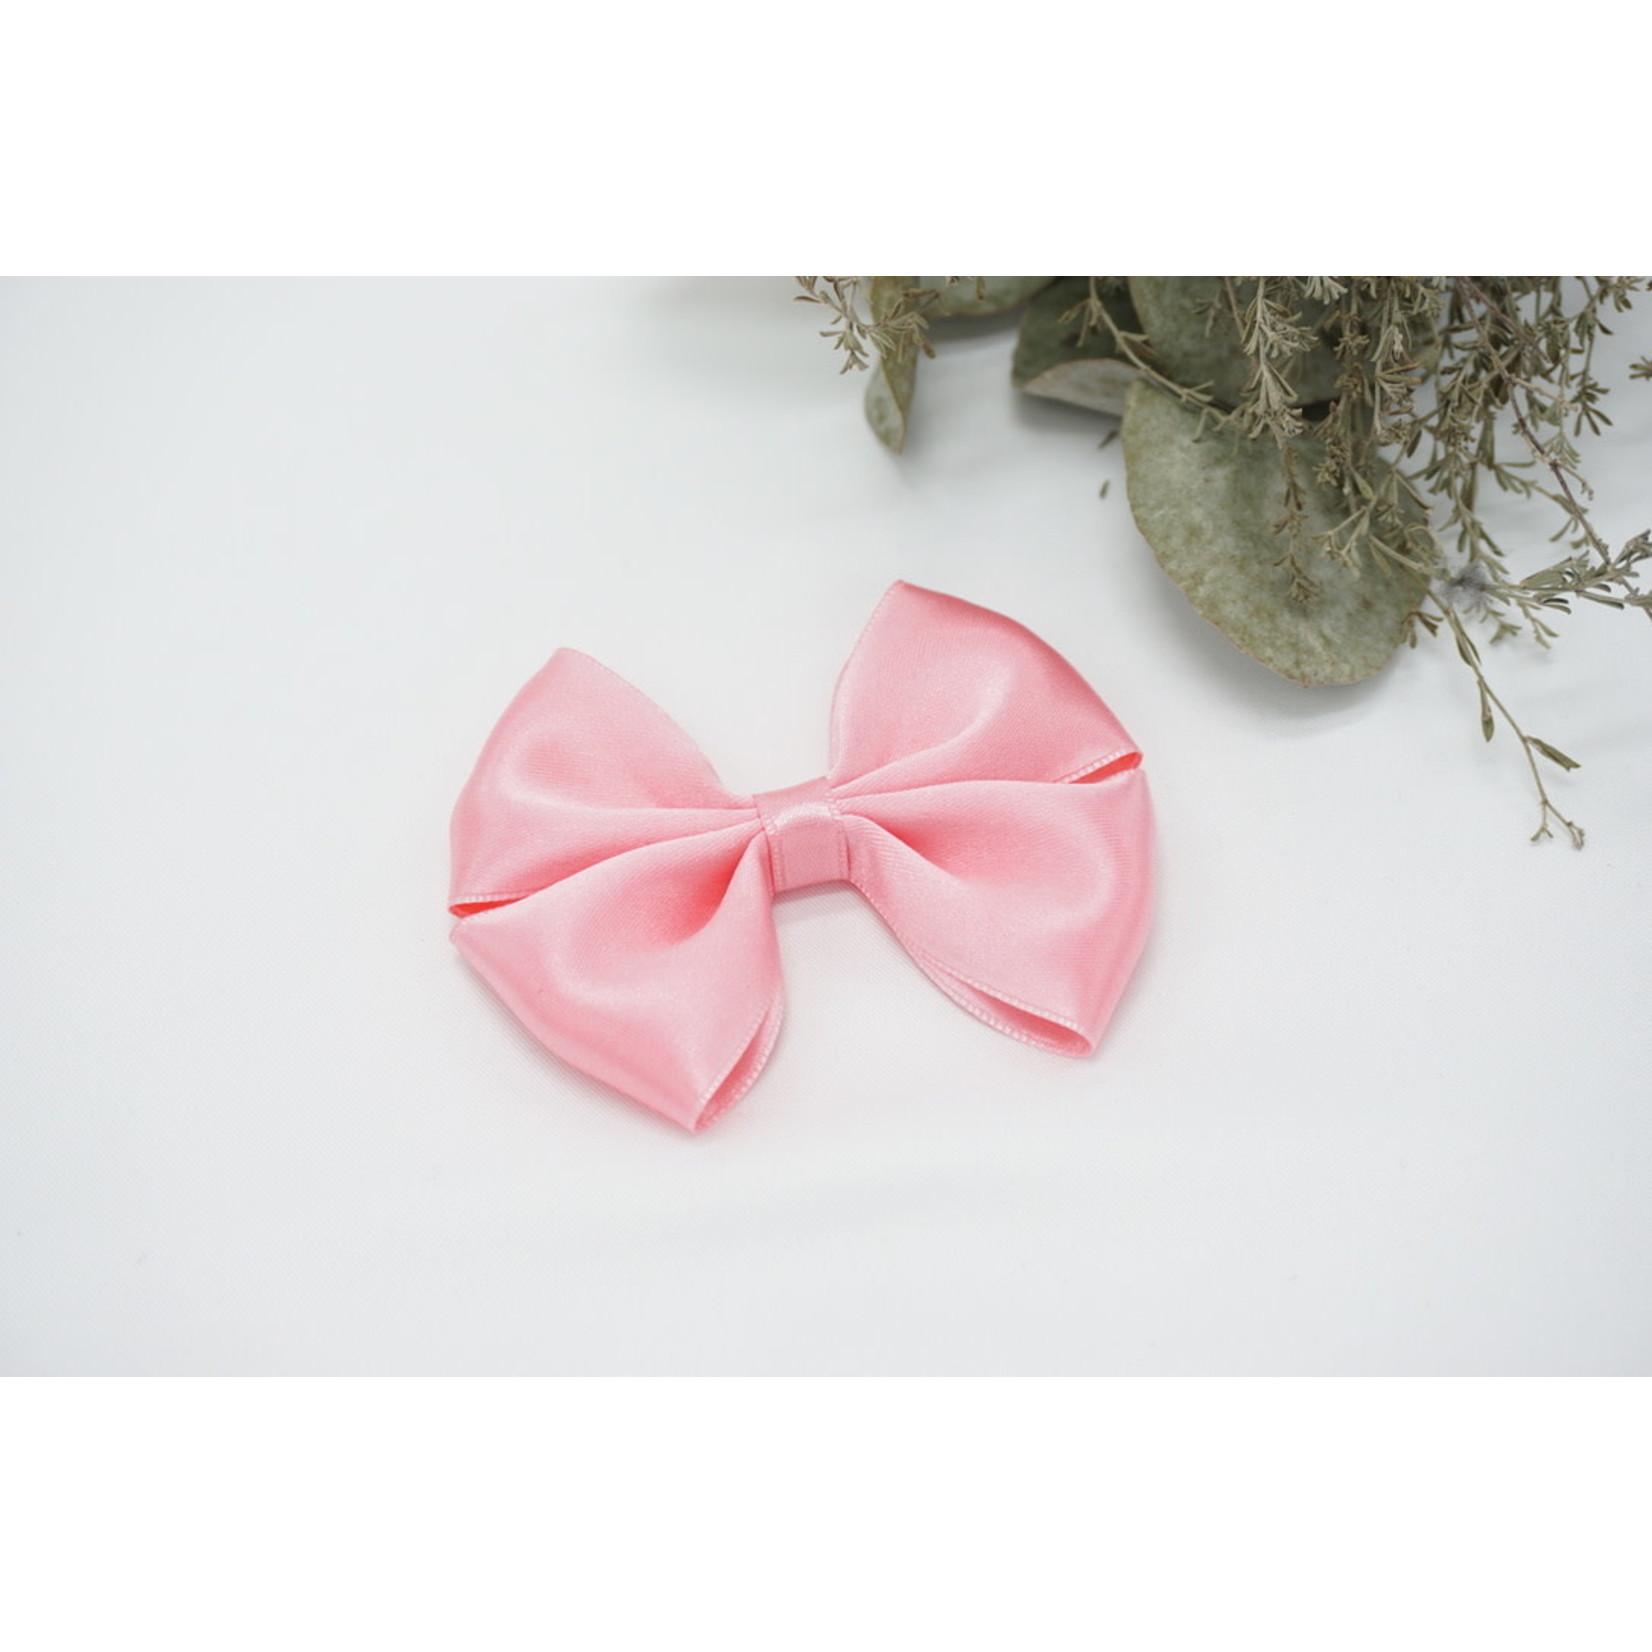 Satin Bow - Bright Pink